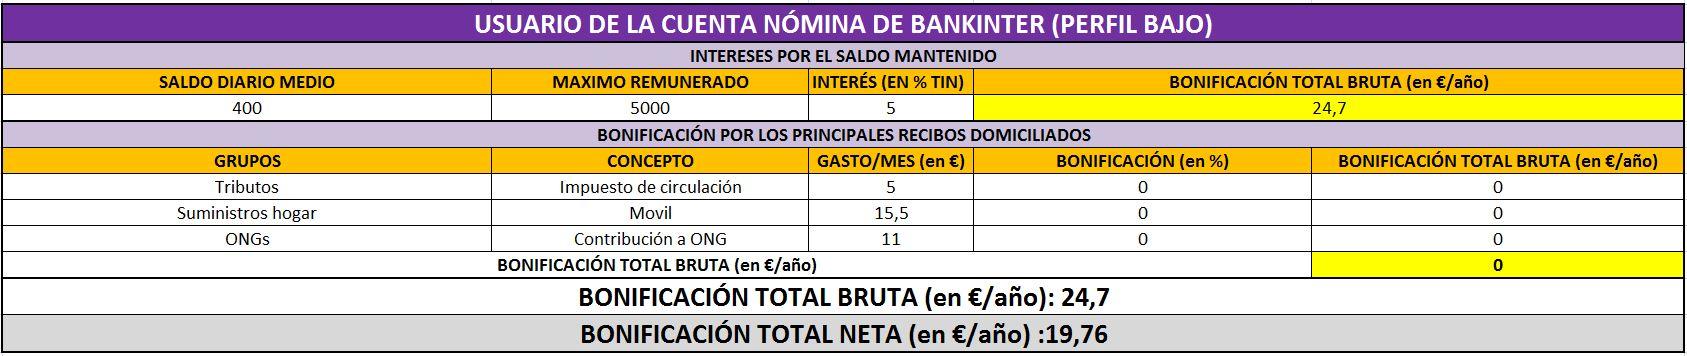 Bankinter%20perfil%20bajo